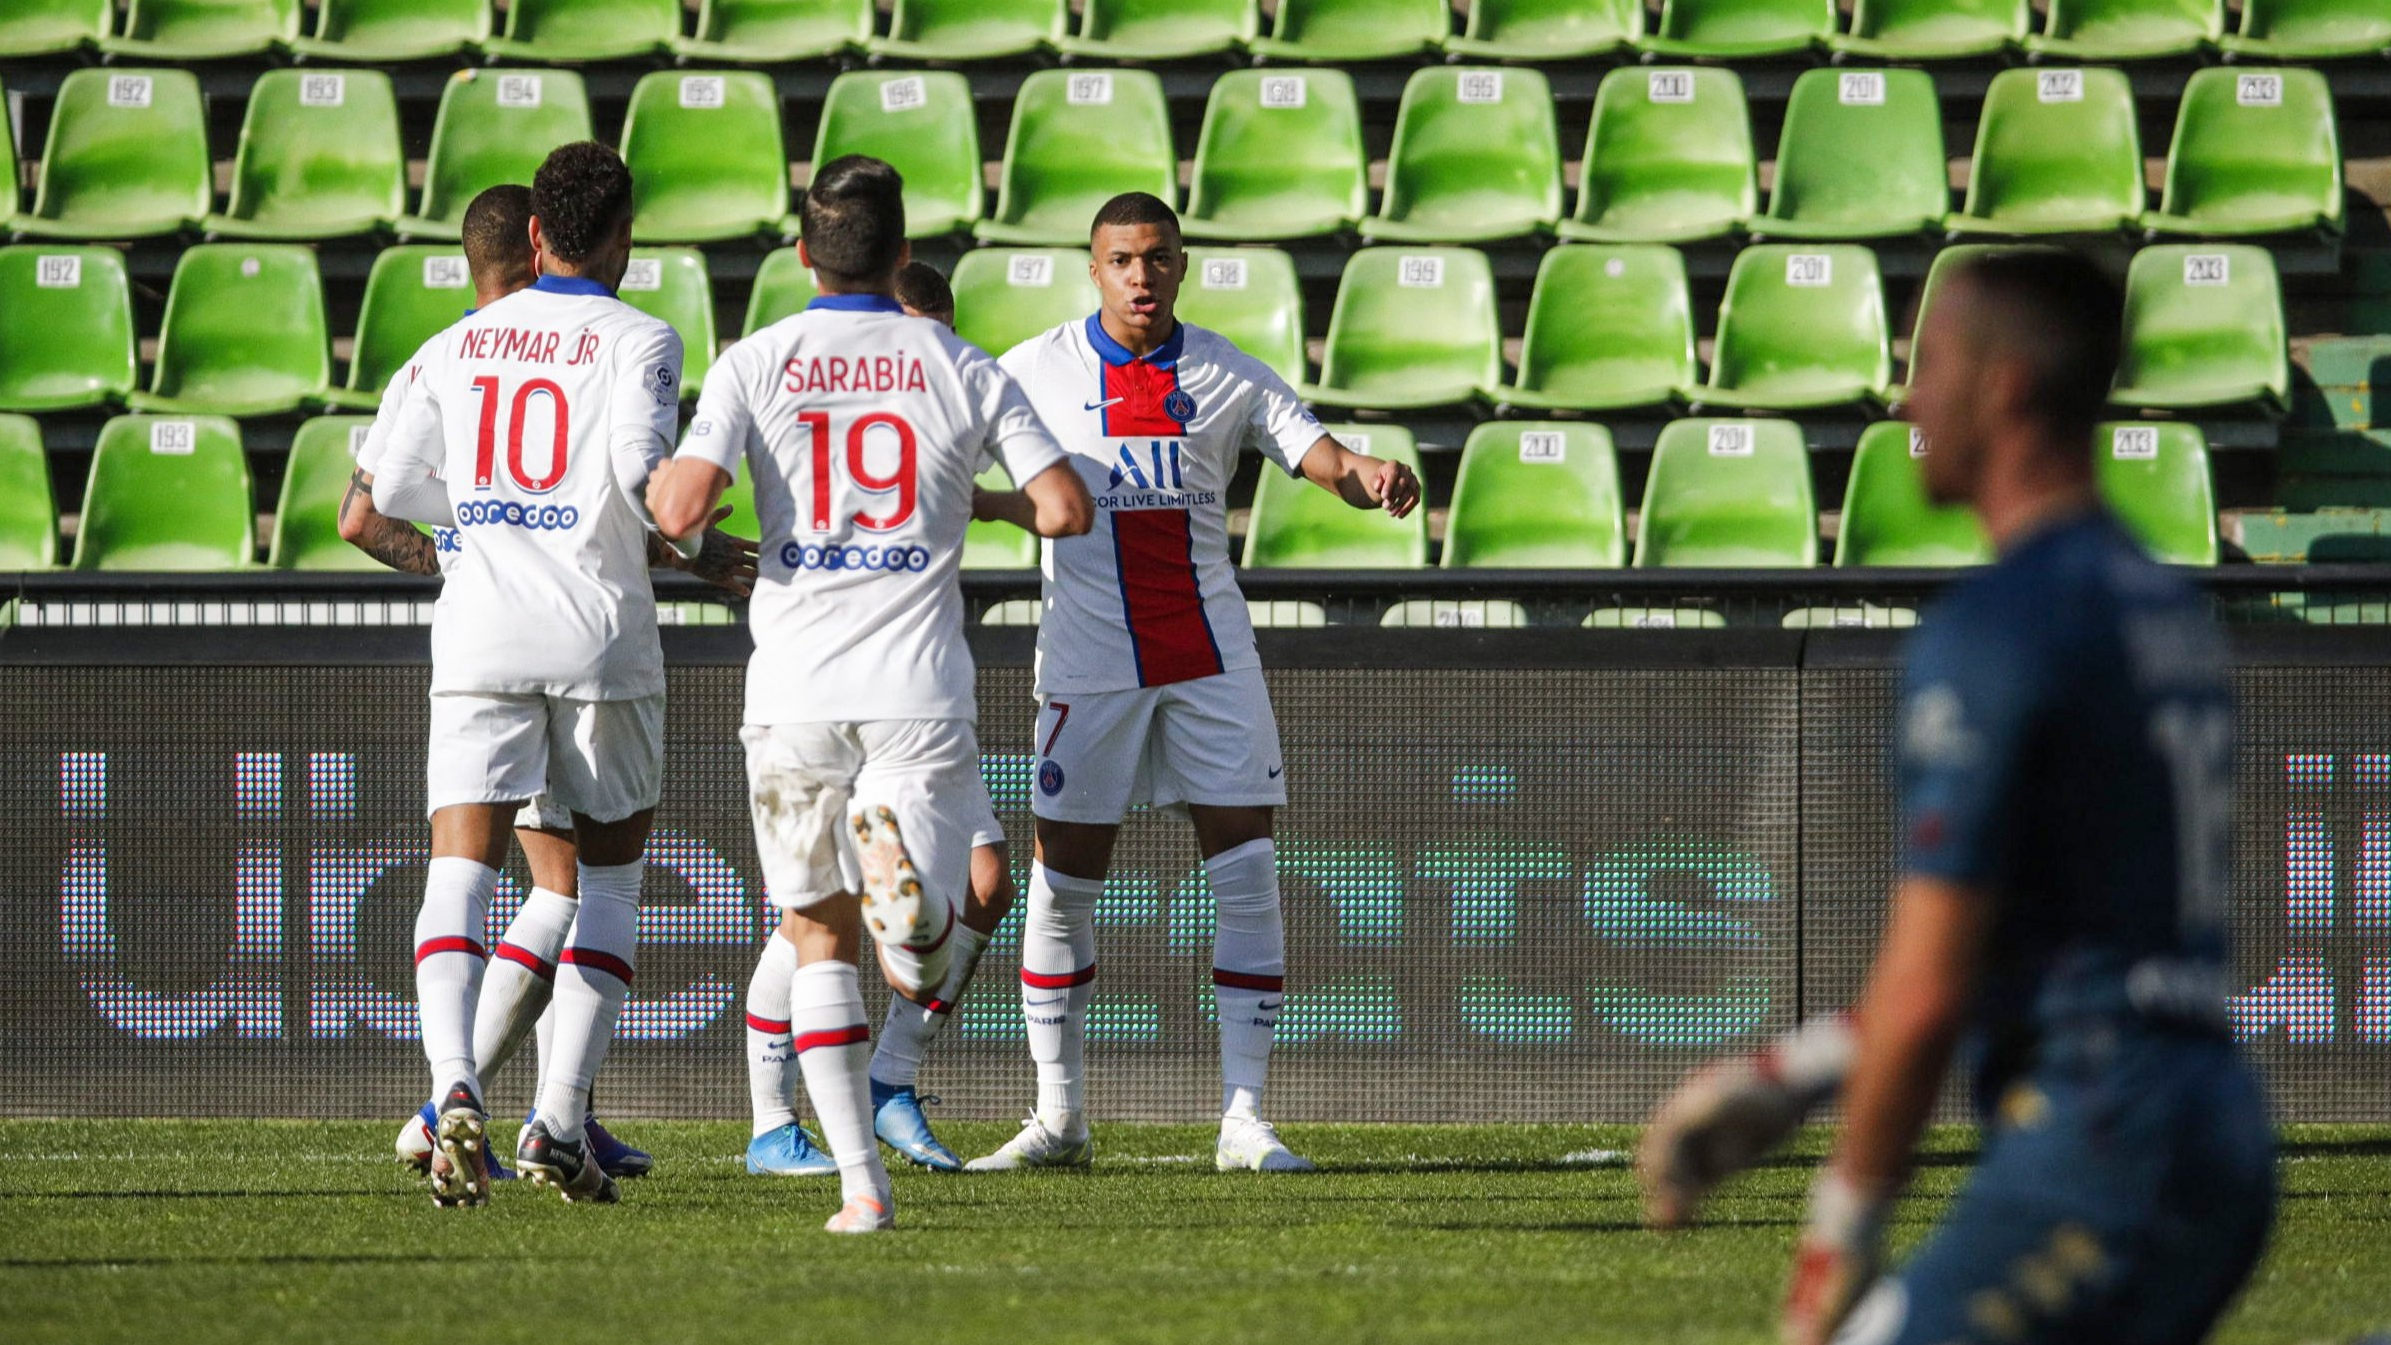 Fransa Ligi Ligue 1: Metz PSG Maç Özeti   Maç Sonucu ve Goller -  Ajansspor.com